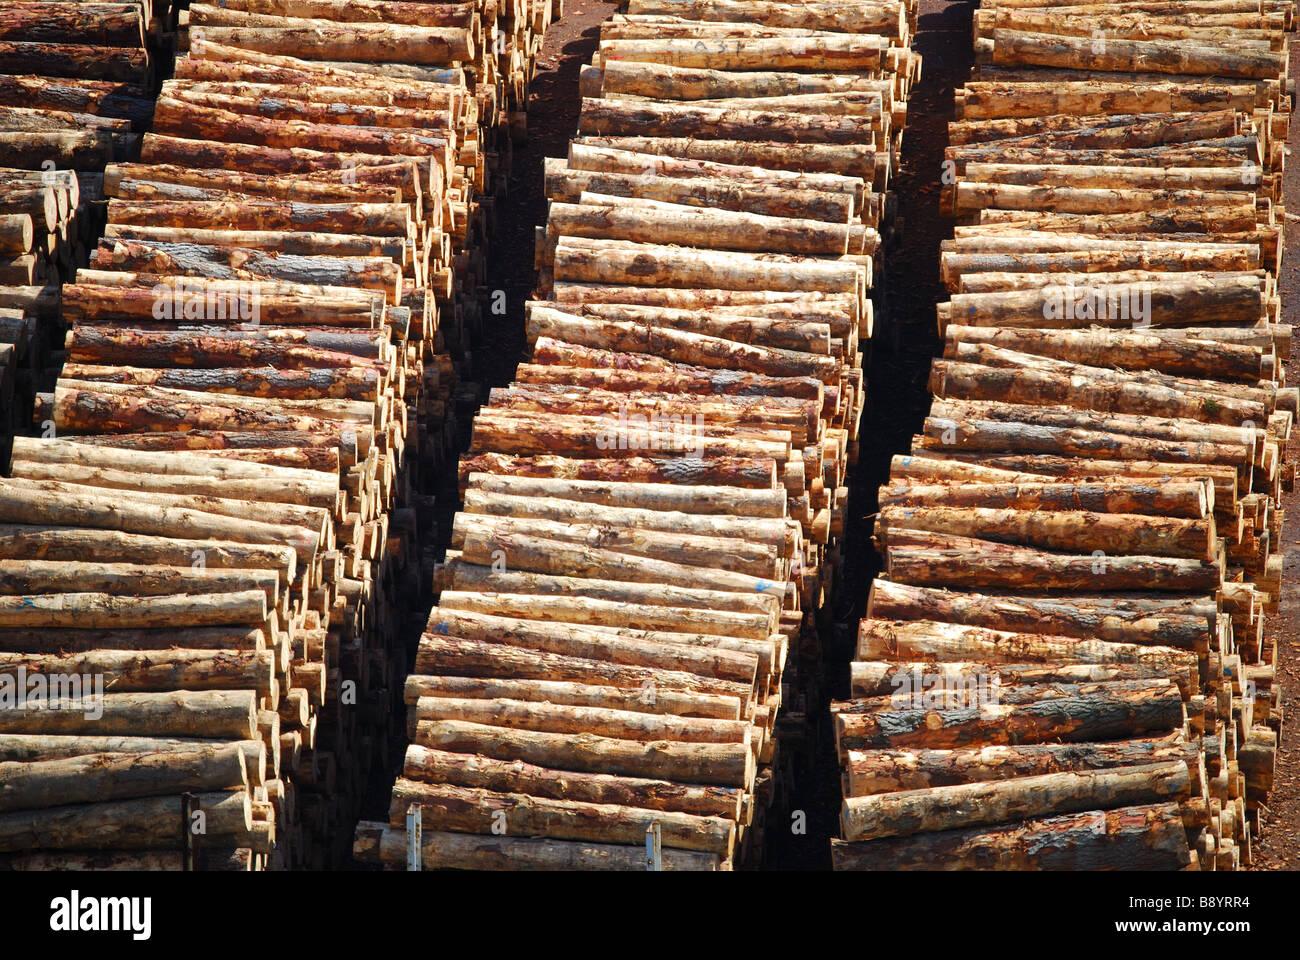 Logs stacked for shipping, Lyttelton, Lyttelton Harbour, Bank's Peninsula, Canterbury, South Island, New Zealand - Stock Image